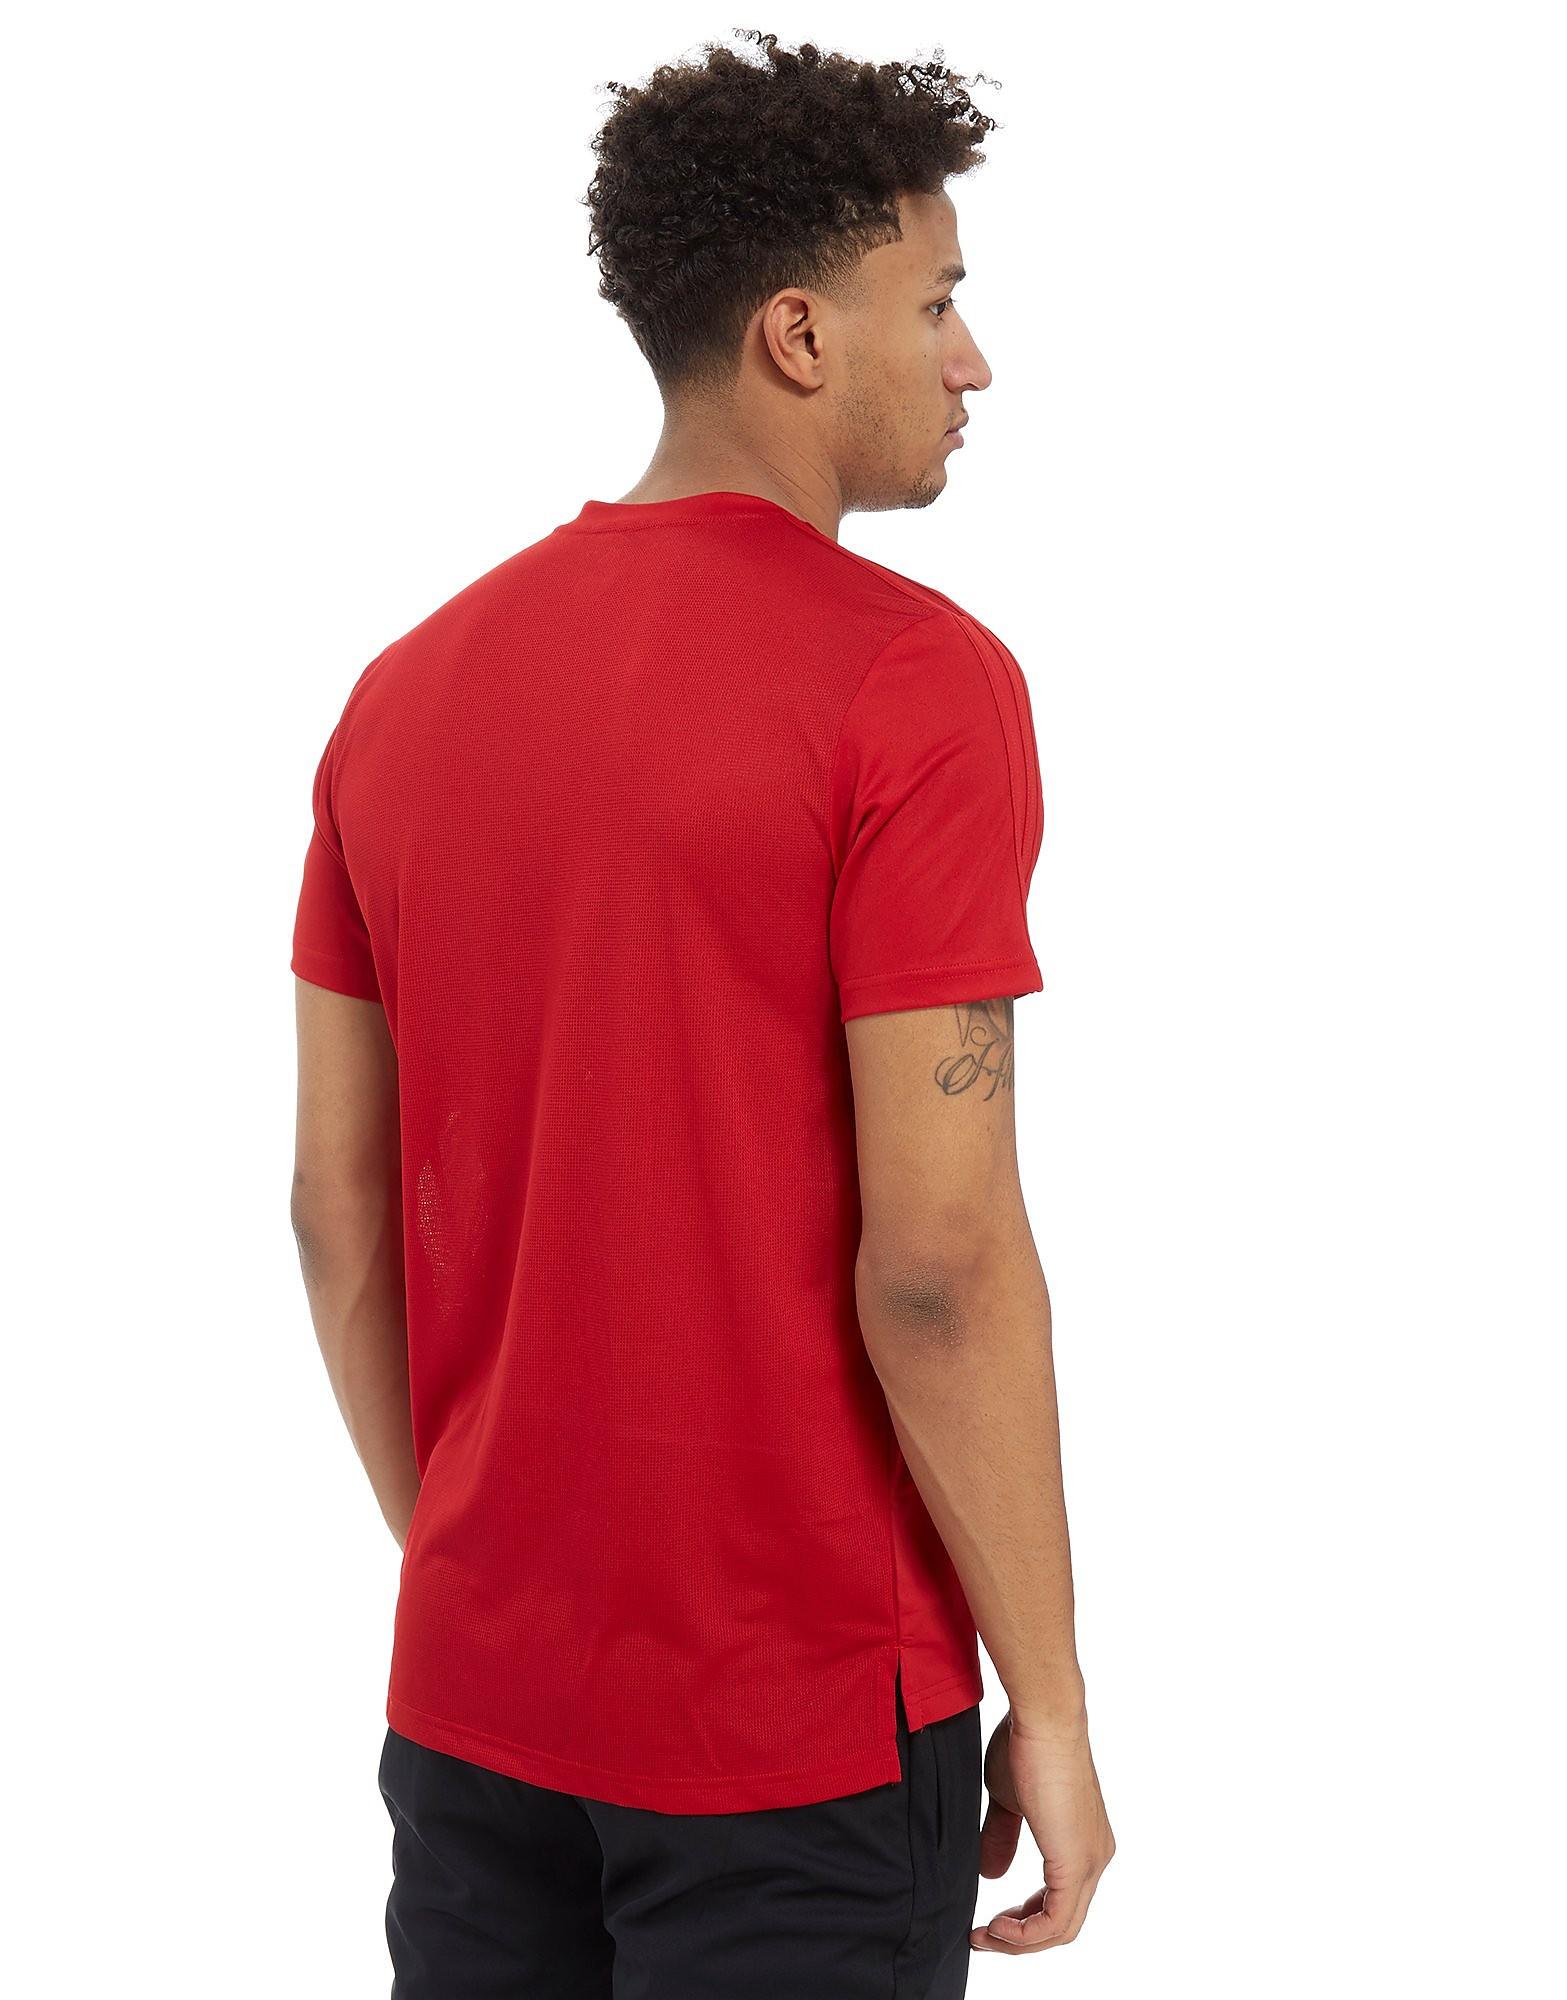 adidas FA Wales 2018 Training Shirt